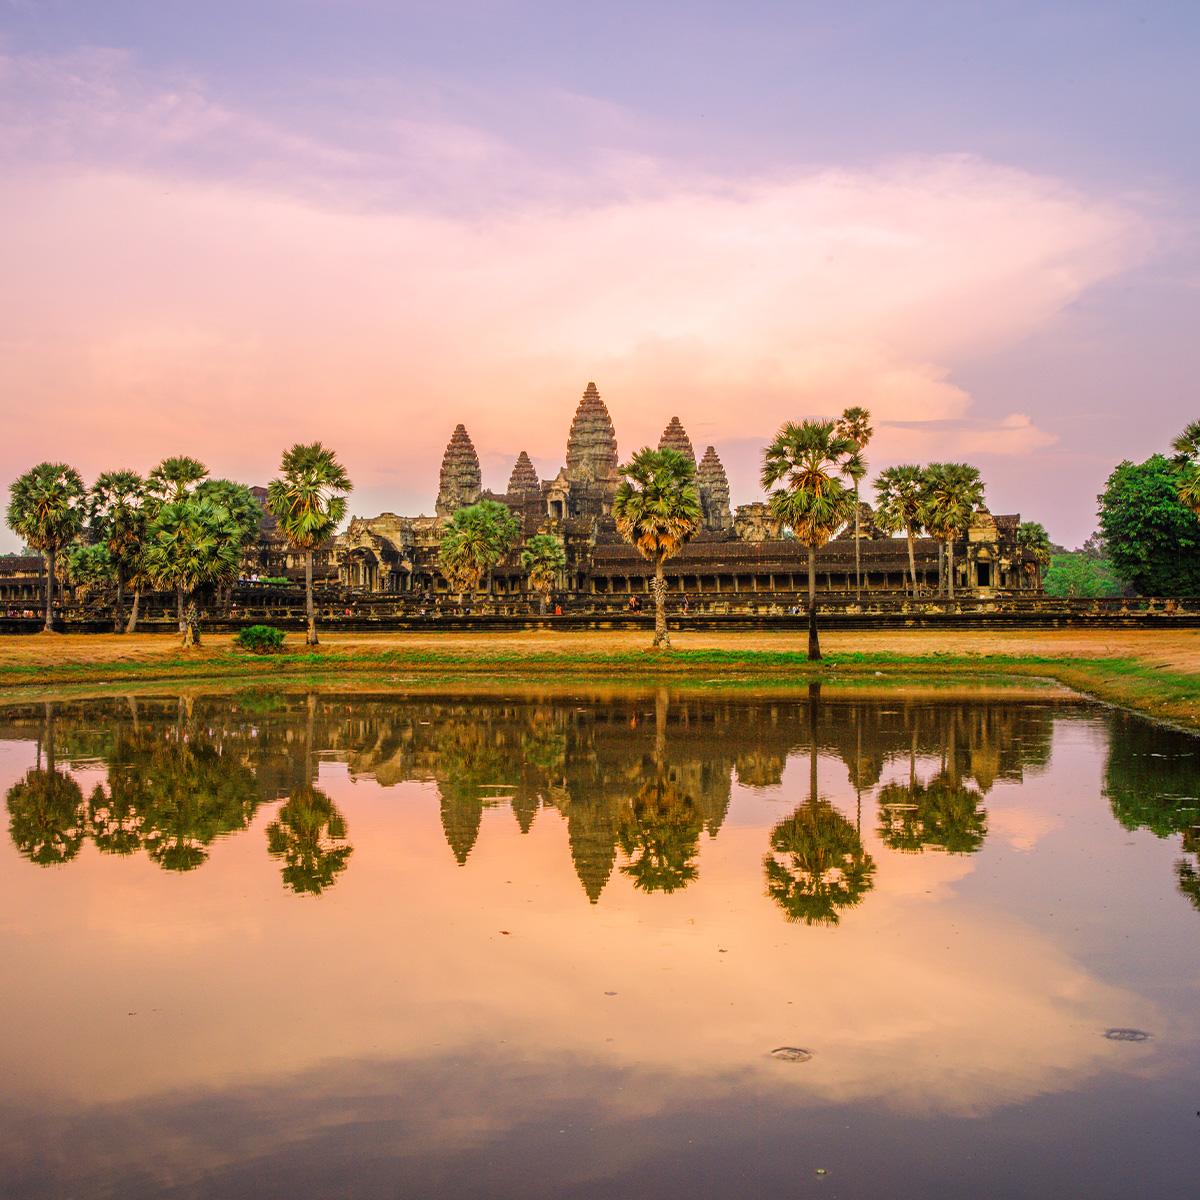 Southeast Asia-EarlyBird2020.jpg